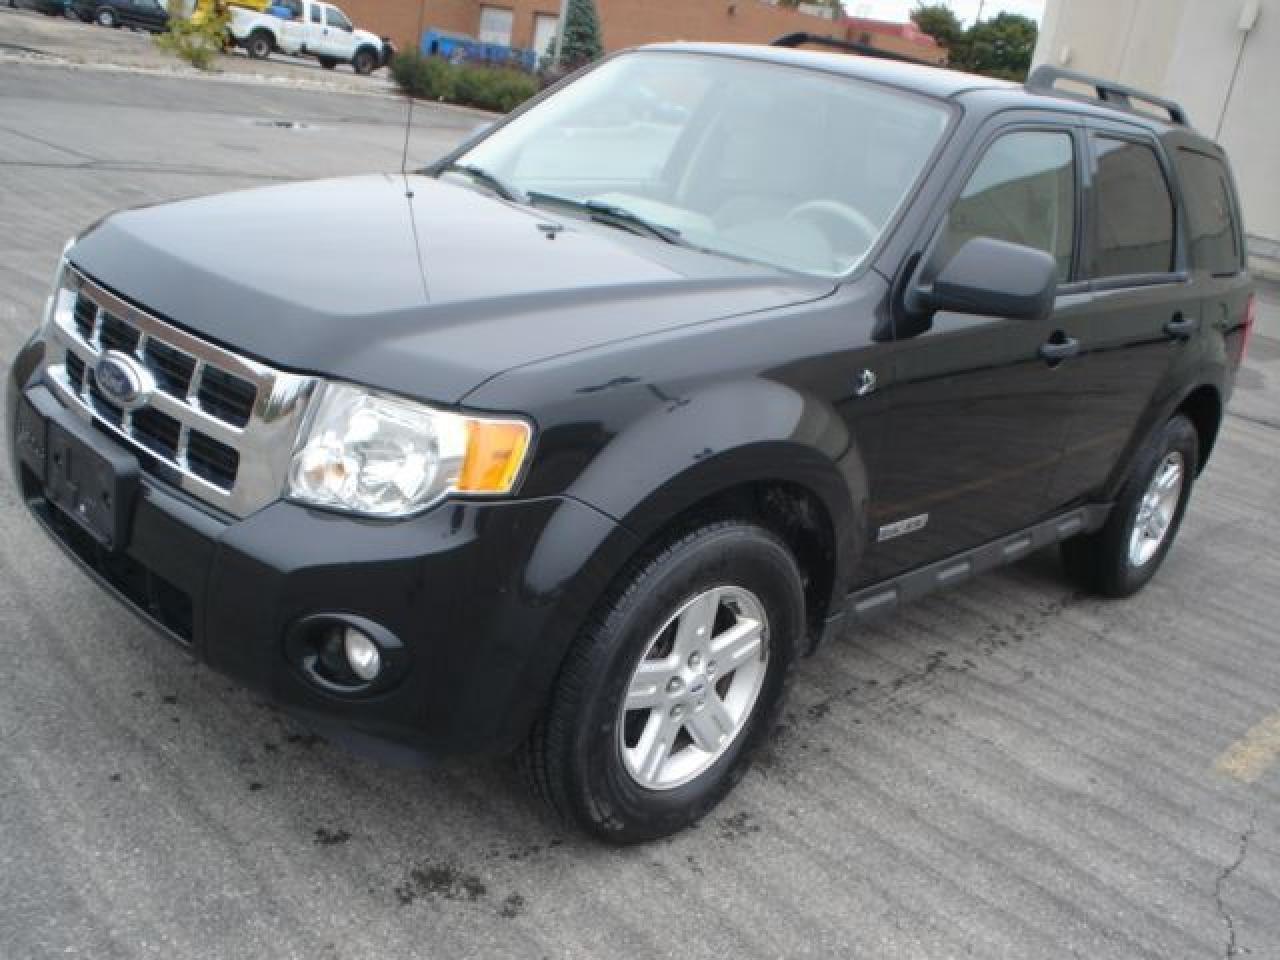 2008 Ford Escape hybrid,gas saver,4wd